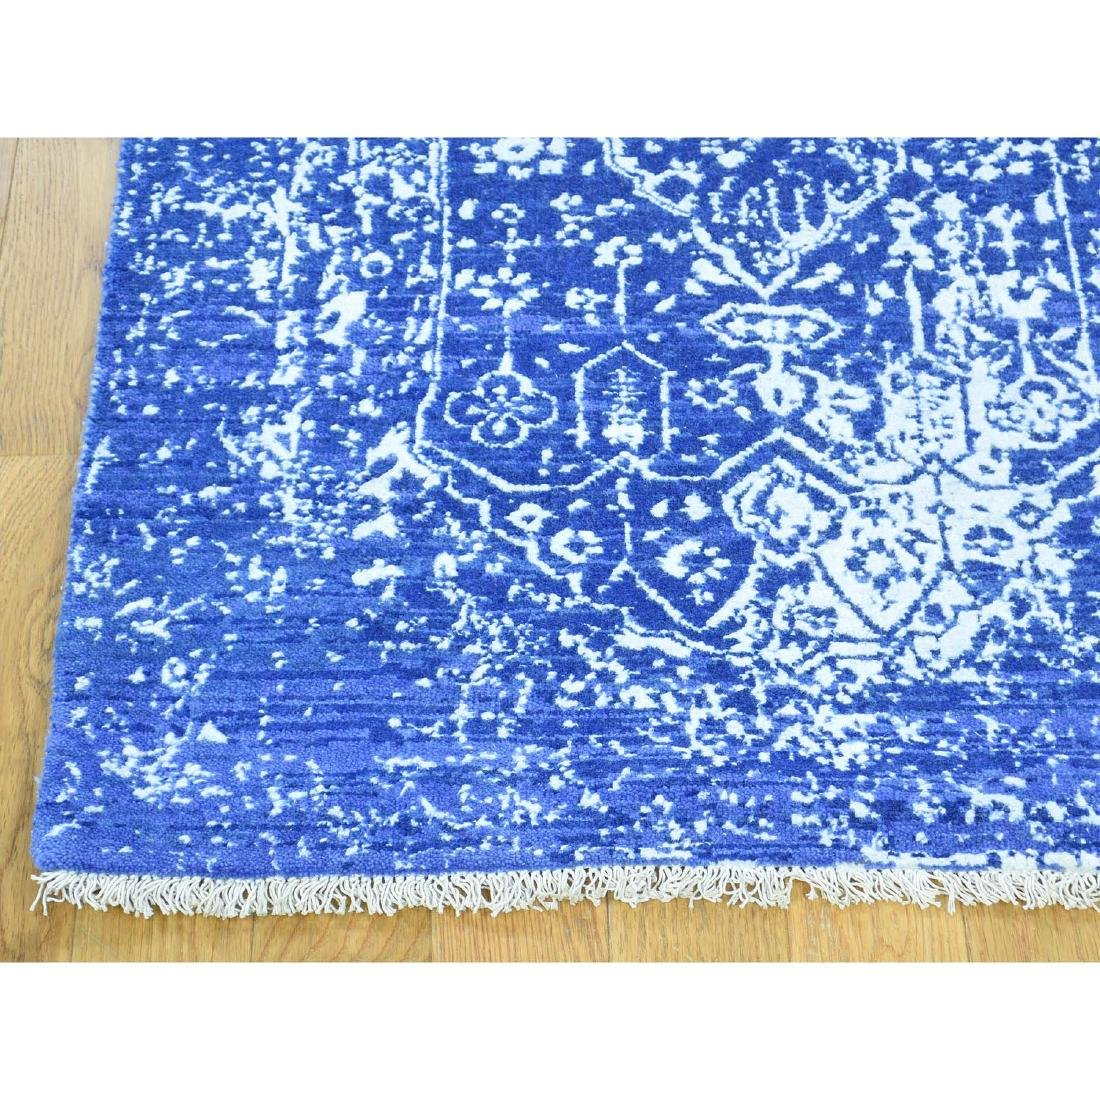 Wool and Silk Hand-Knotted Broken Persian Design Runner - 6